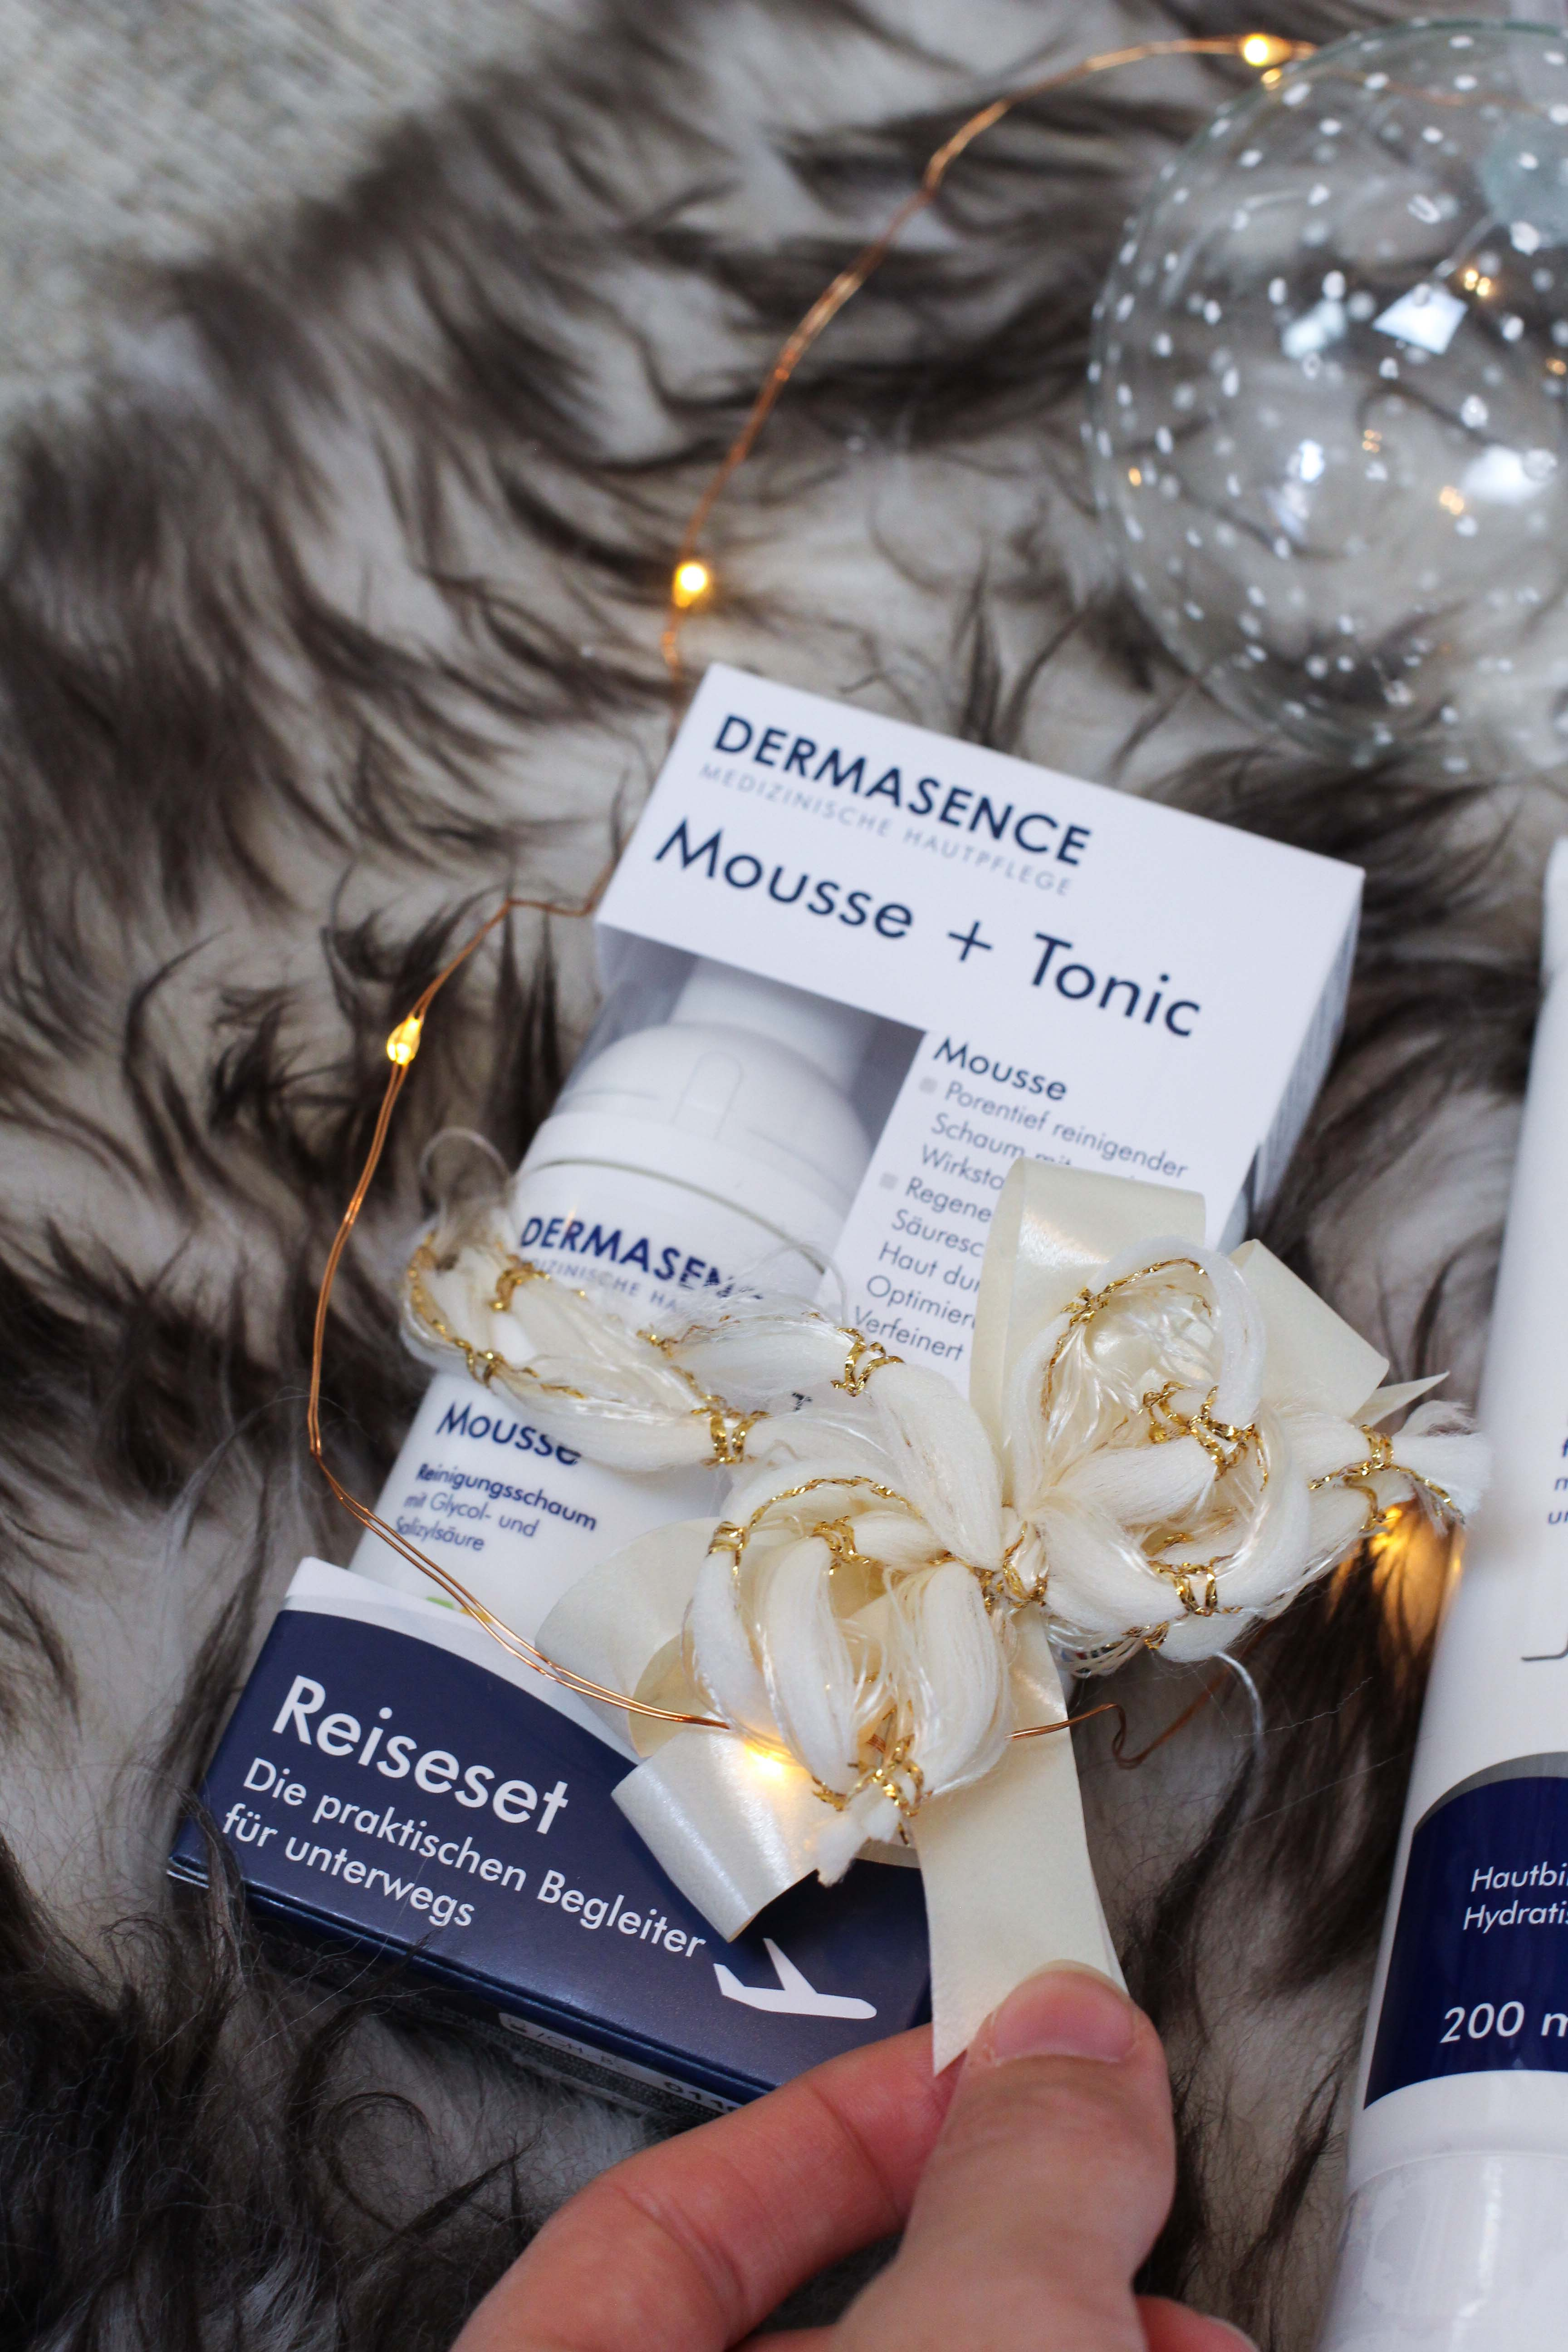 Blogger Adventskalender Gewinnspiel Dermasence Hautpflege Winter Urlaubs-Reiseset Tonic Mousse Reisegröße Beauty Blogger Tipps